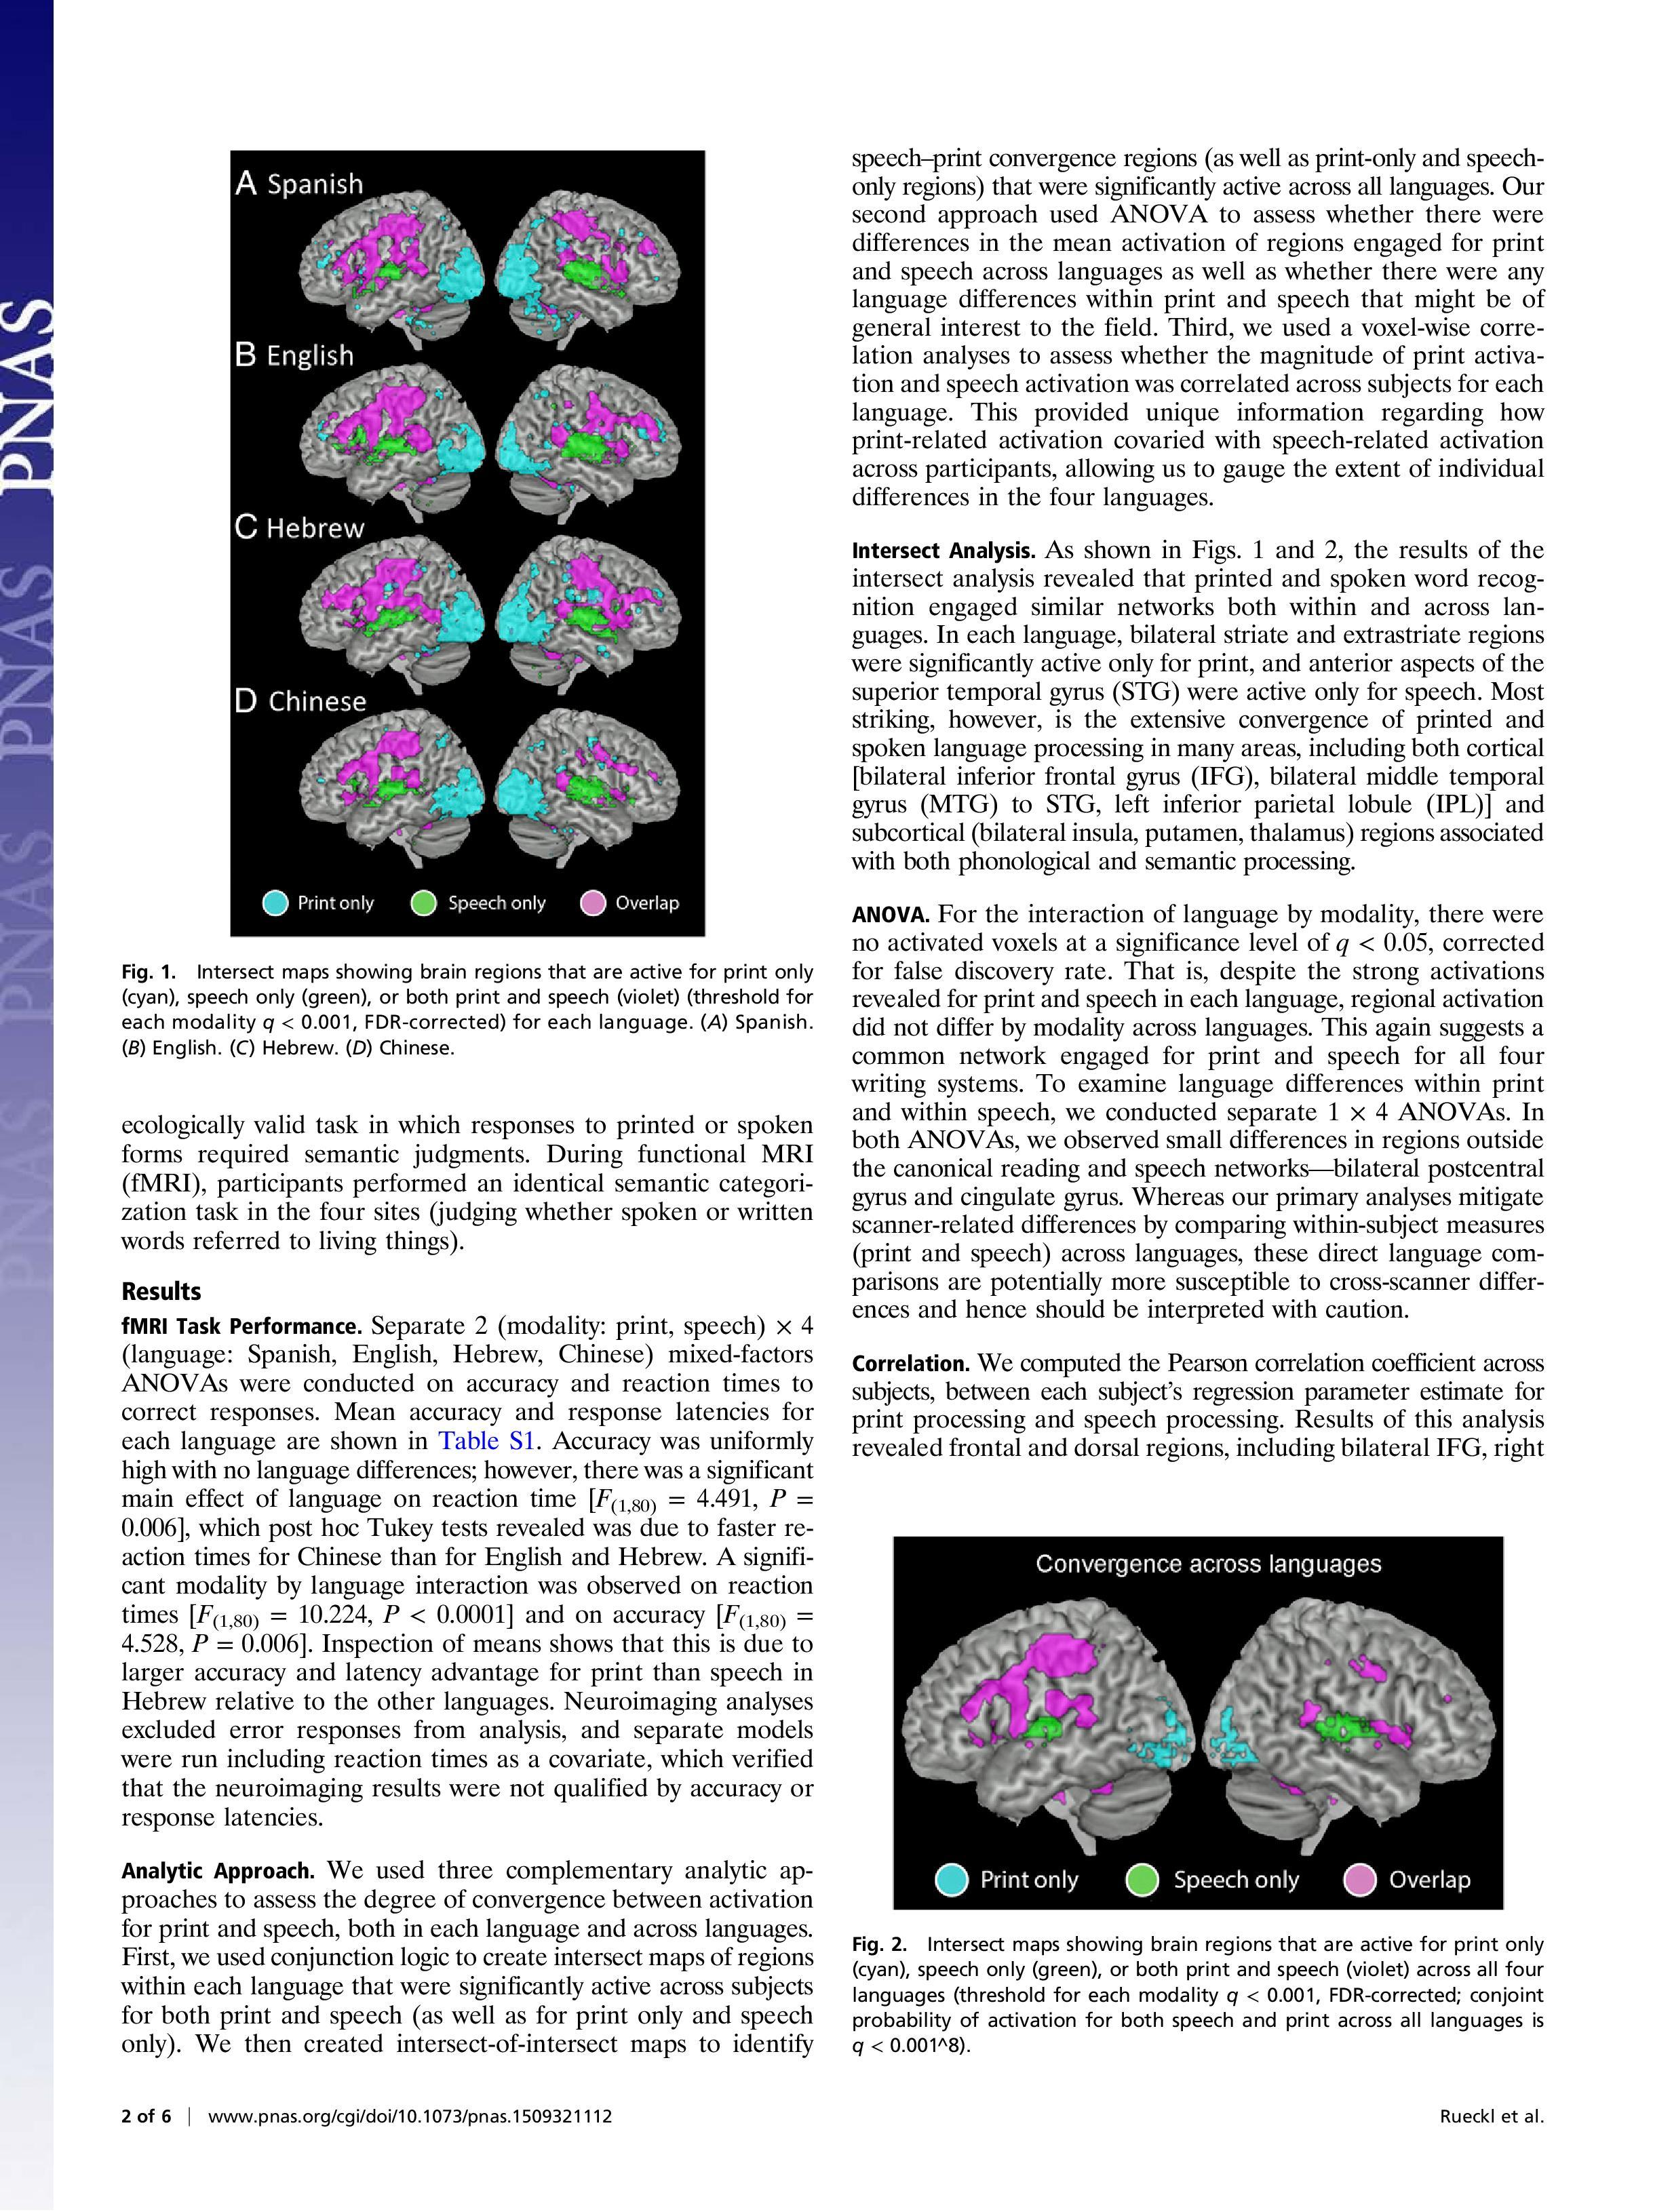 PNAS-2015-Rueckl-1509321112 (1)-page-002.jpg